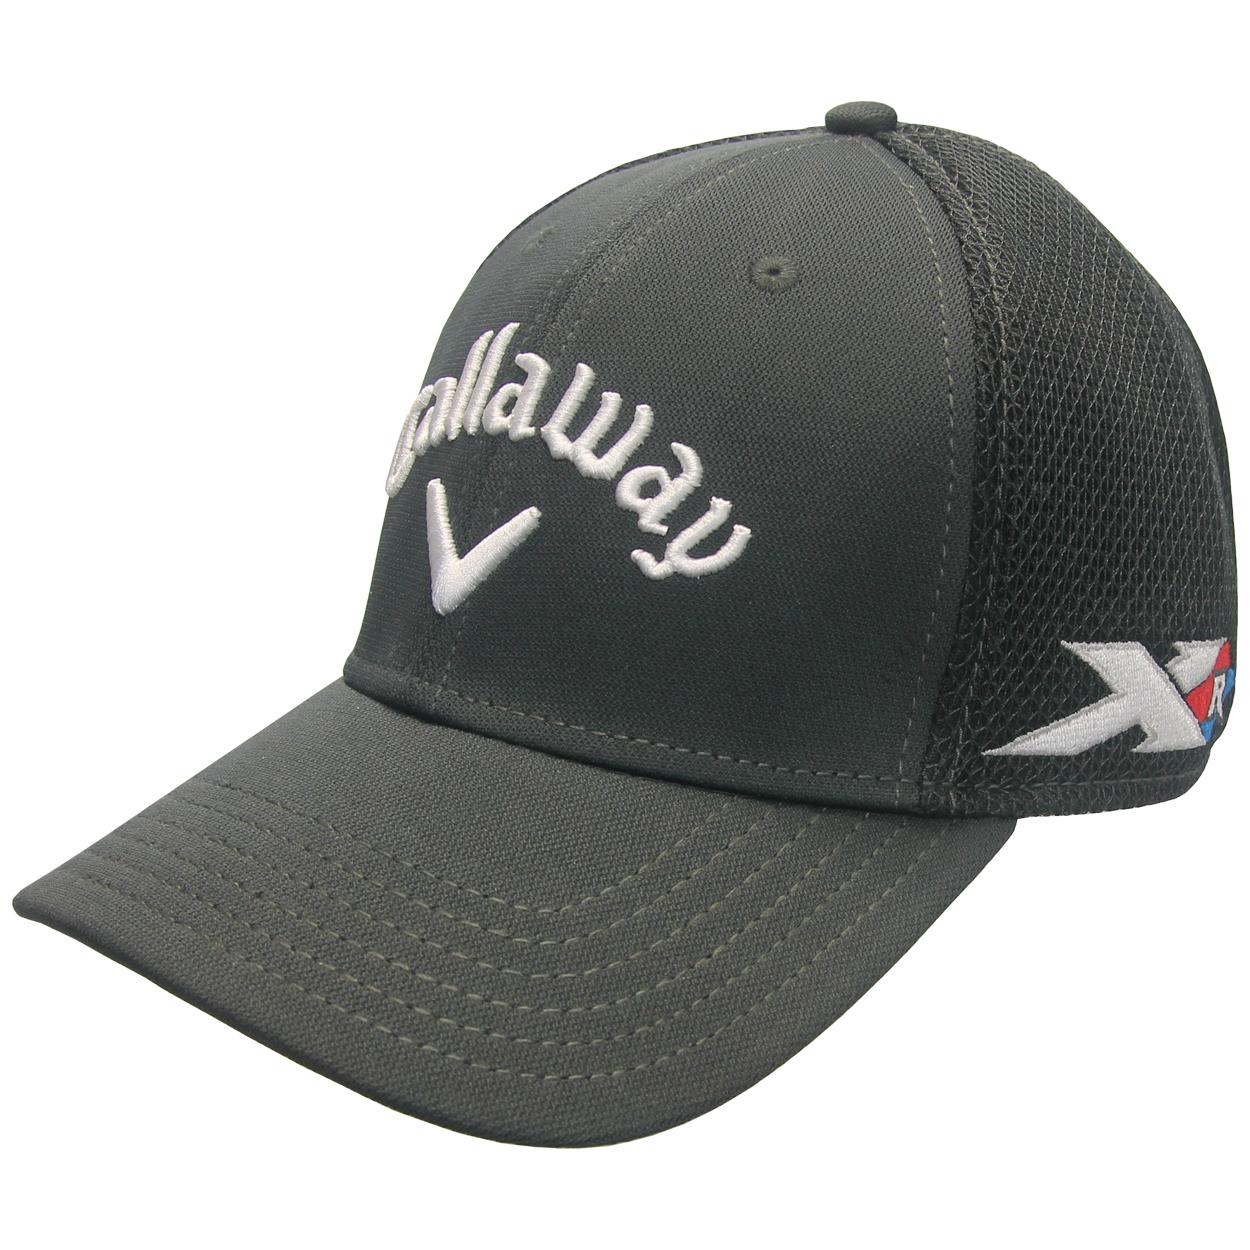 Callaway Golf Big Bertha XR Tour Fitted Hat - GolfEtail.com 0c8f8970bdf